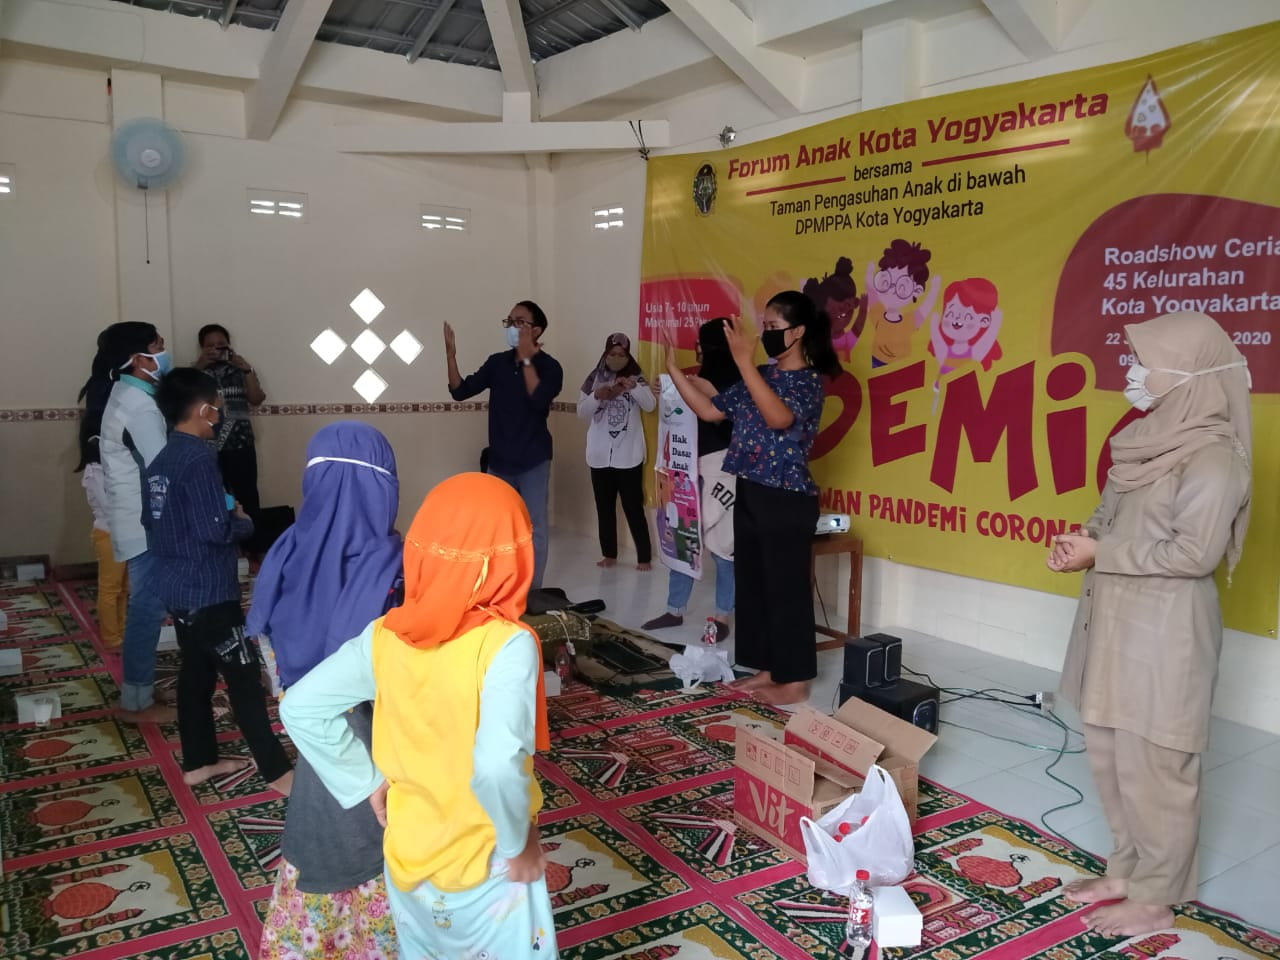 Sosialisasi Forum Anak KOta